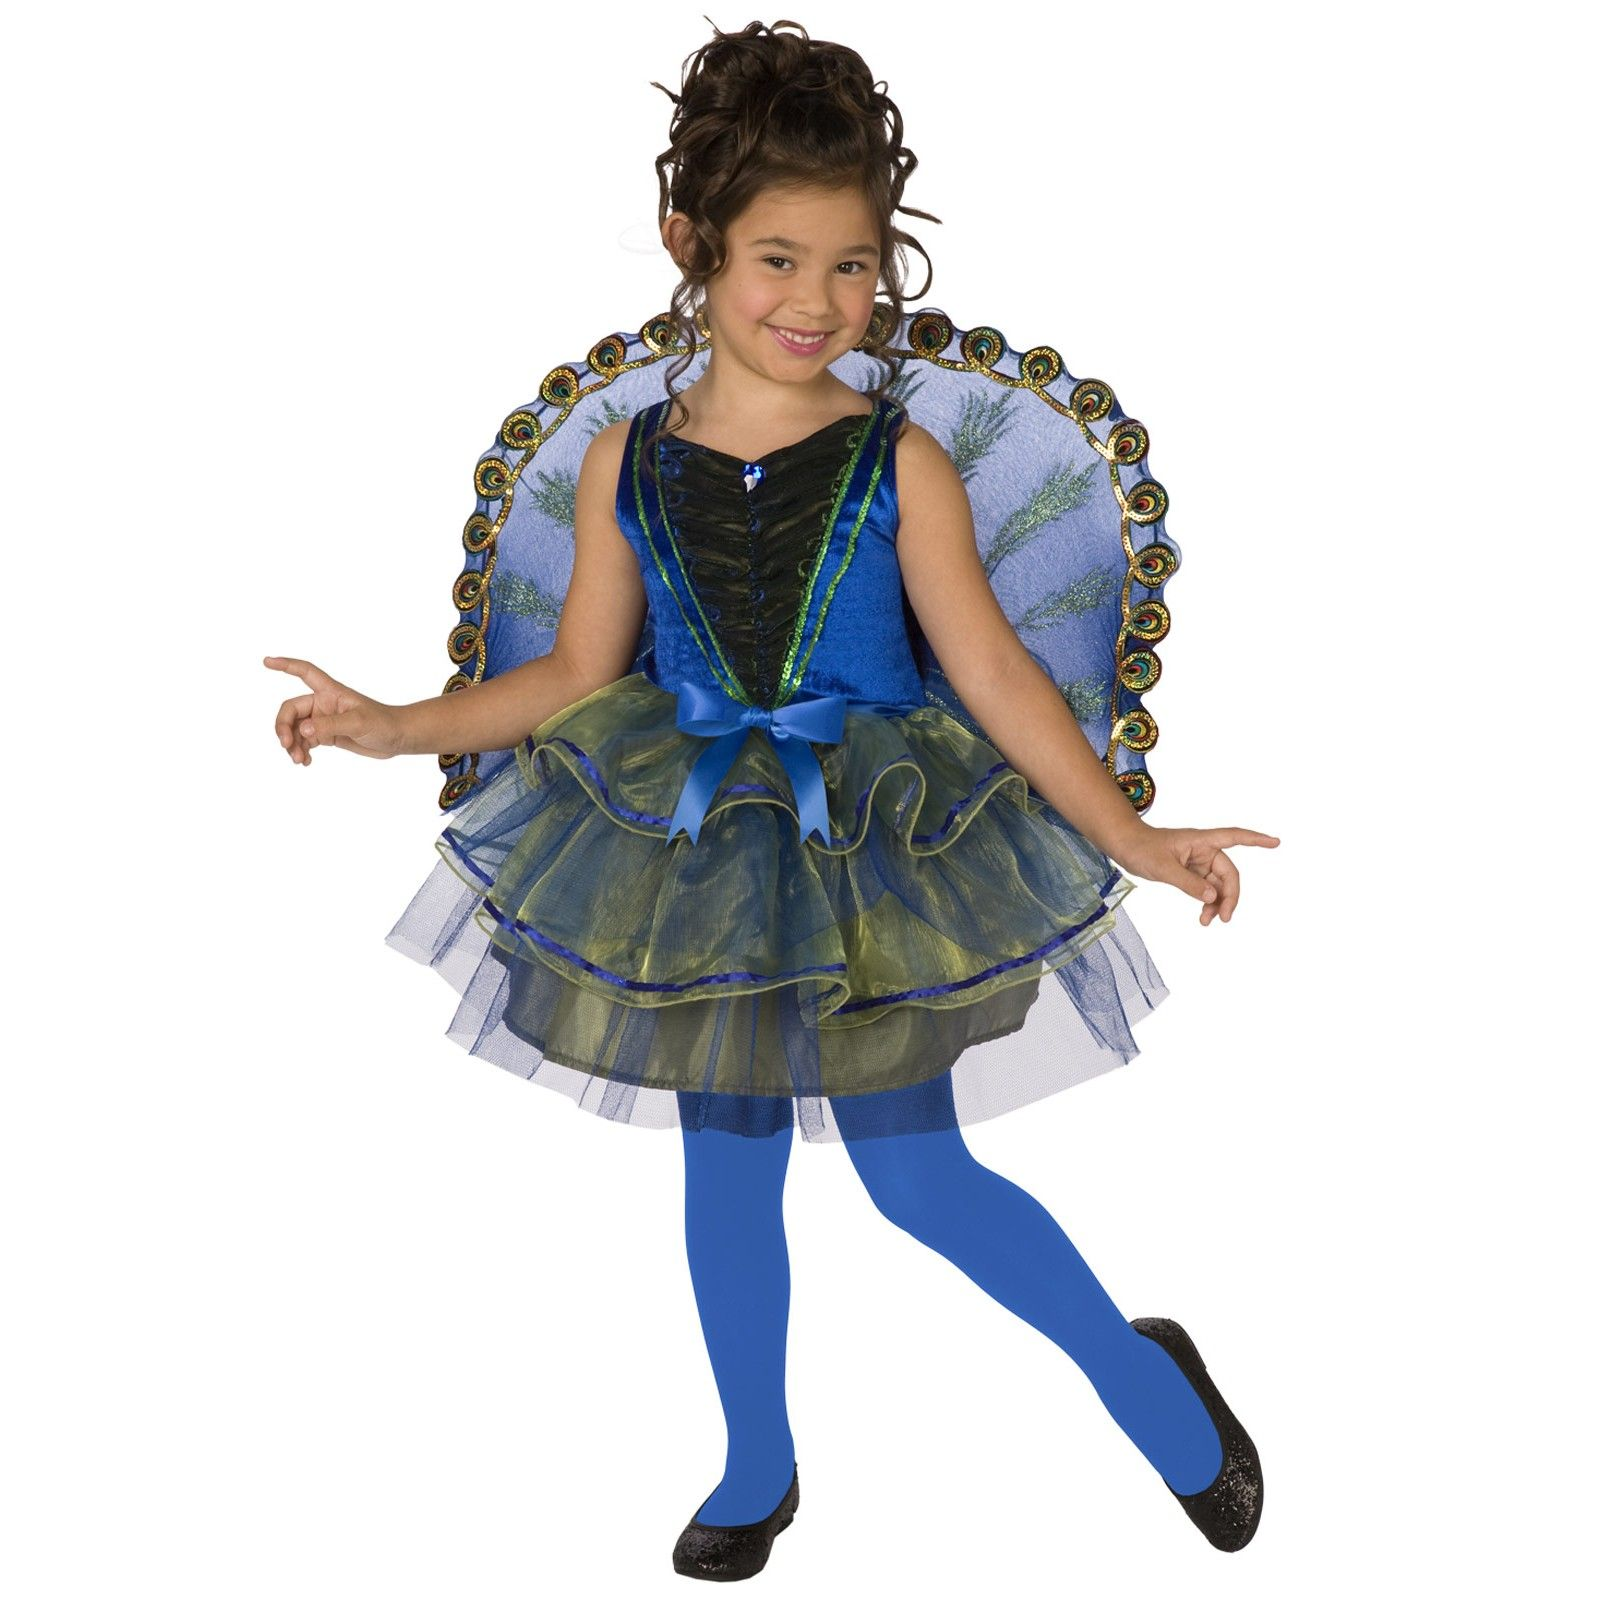 Pretty Peacock Child Costume $20  sc 1 st  Pinterest & Pretty Peacock Child Costume $20   Cute Halloween costume ideas ...